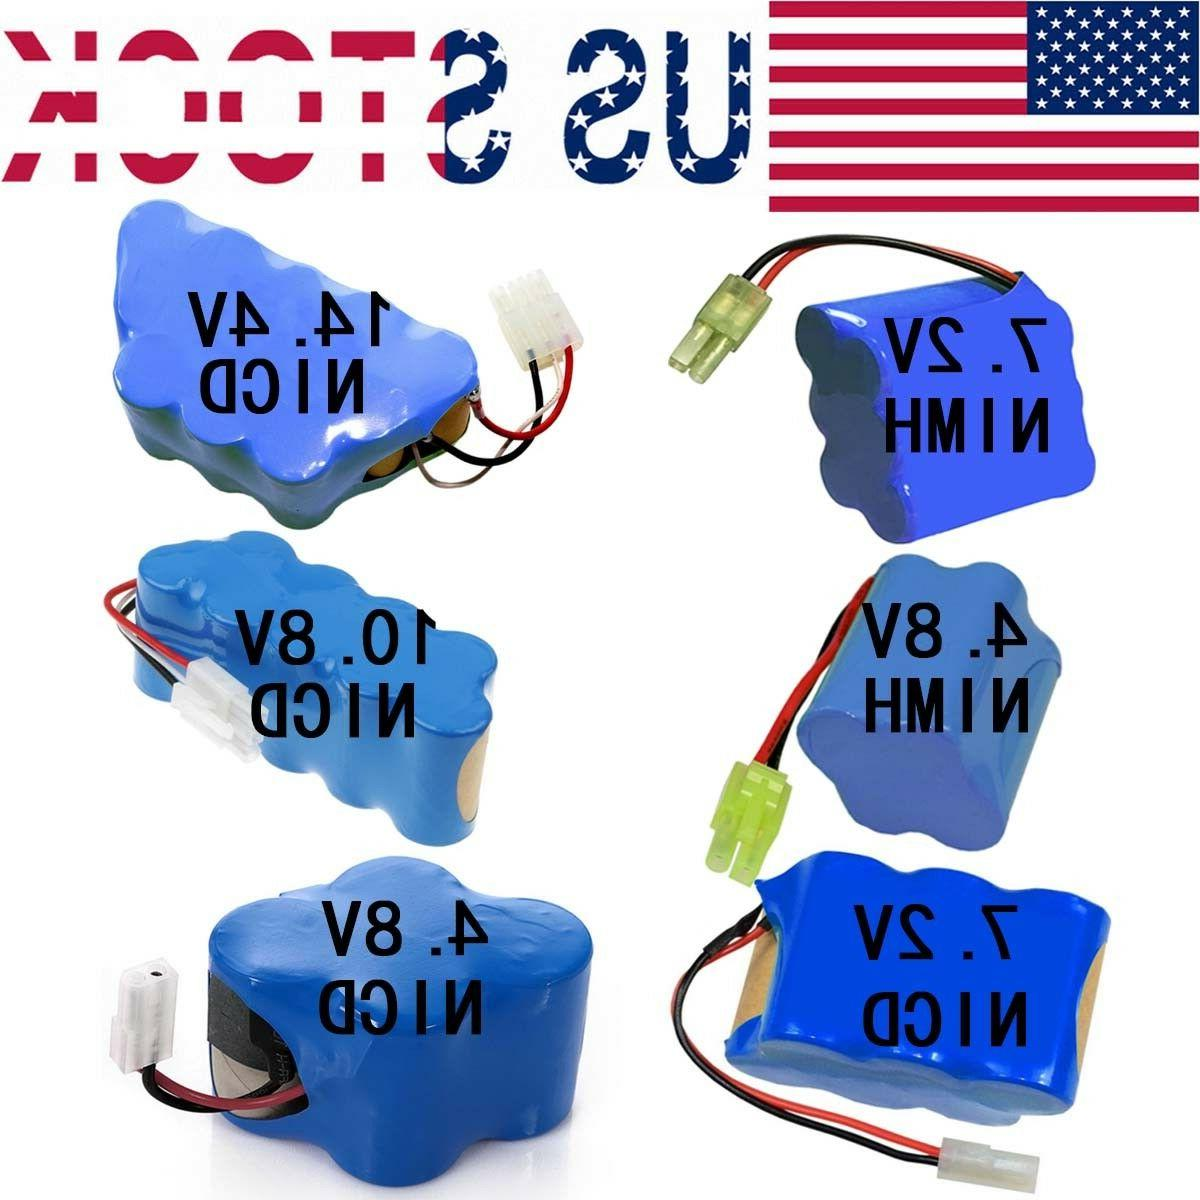 Replacement Battery For Shark XBT1106N XBT1106 V1945Z XB2950V2950 XB2700 XB1945W